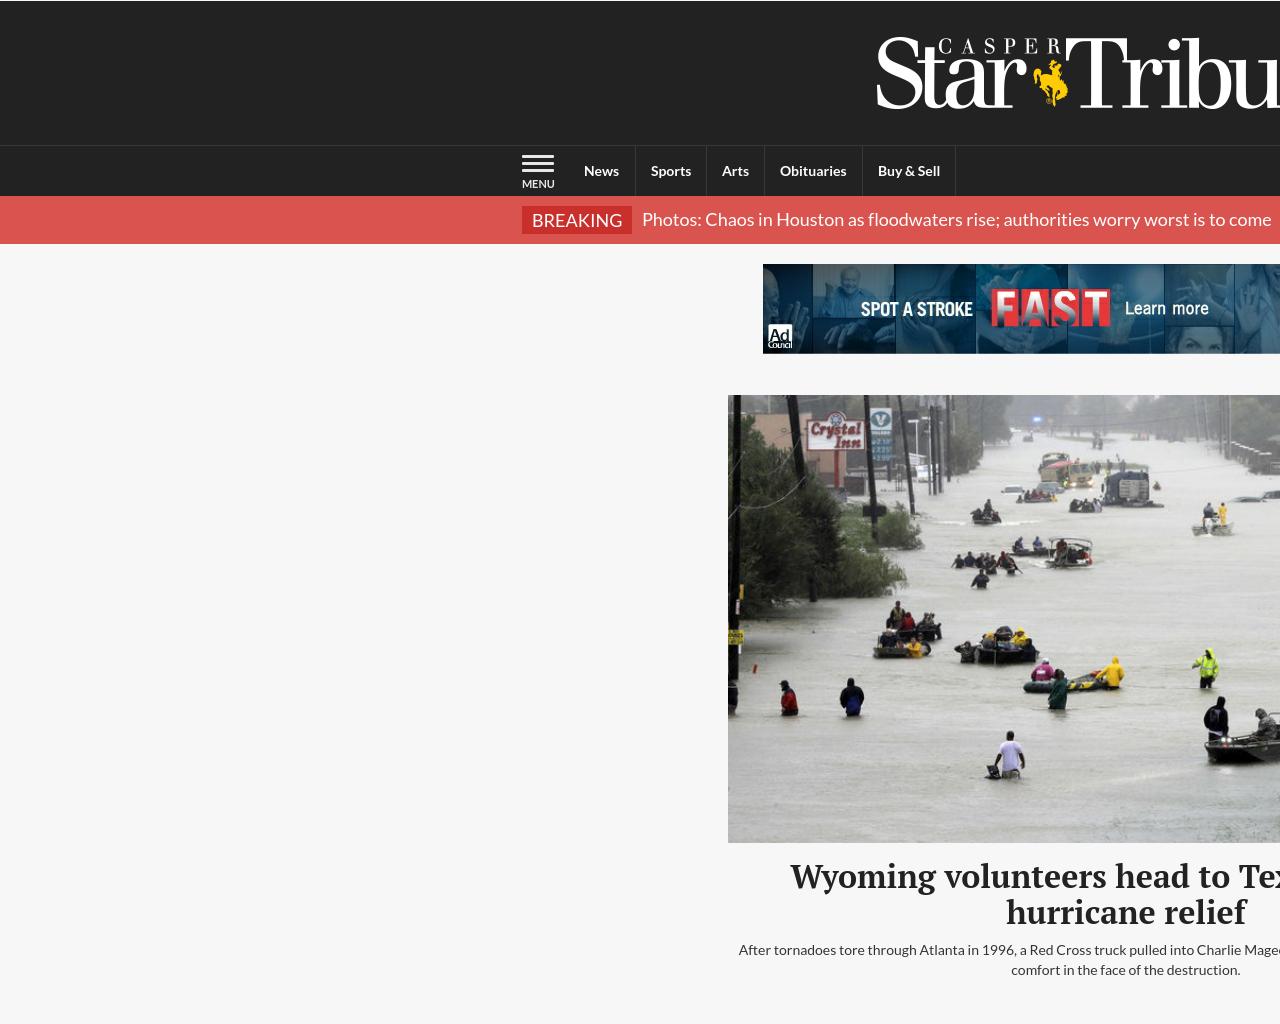 Casper-Star-Tribune-Advertising-Reviews-Pricing